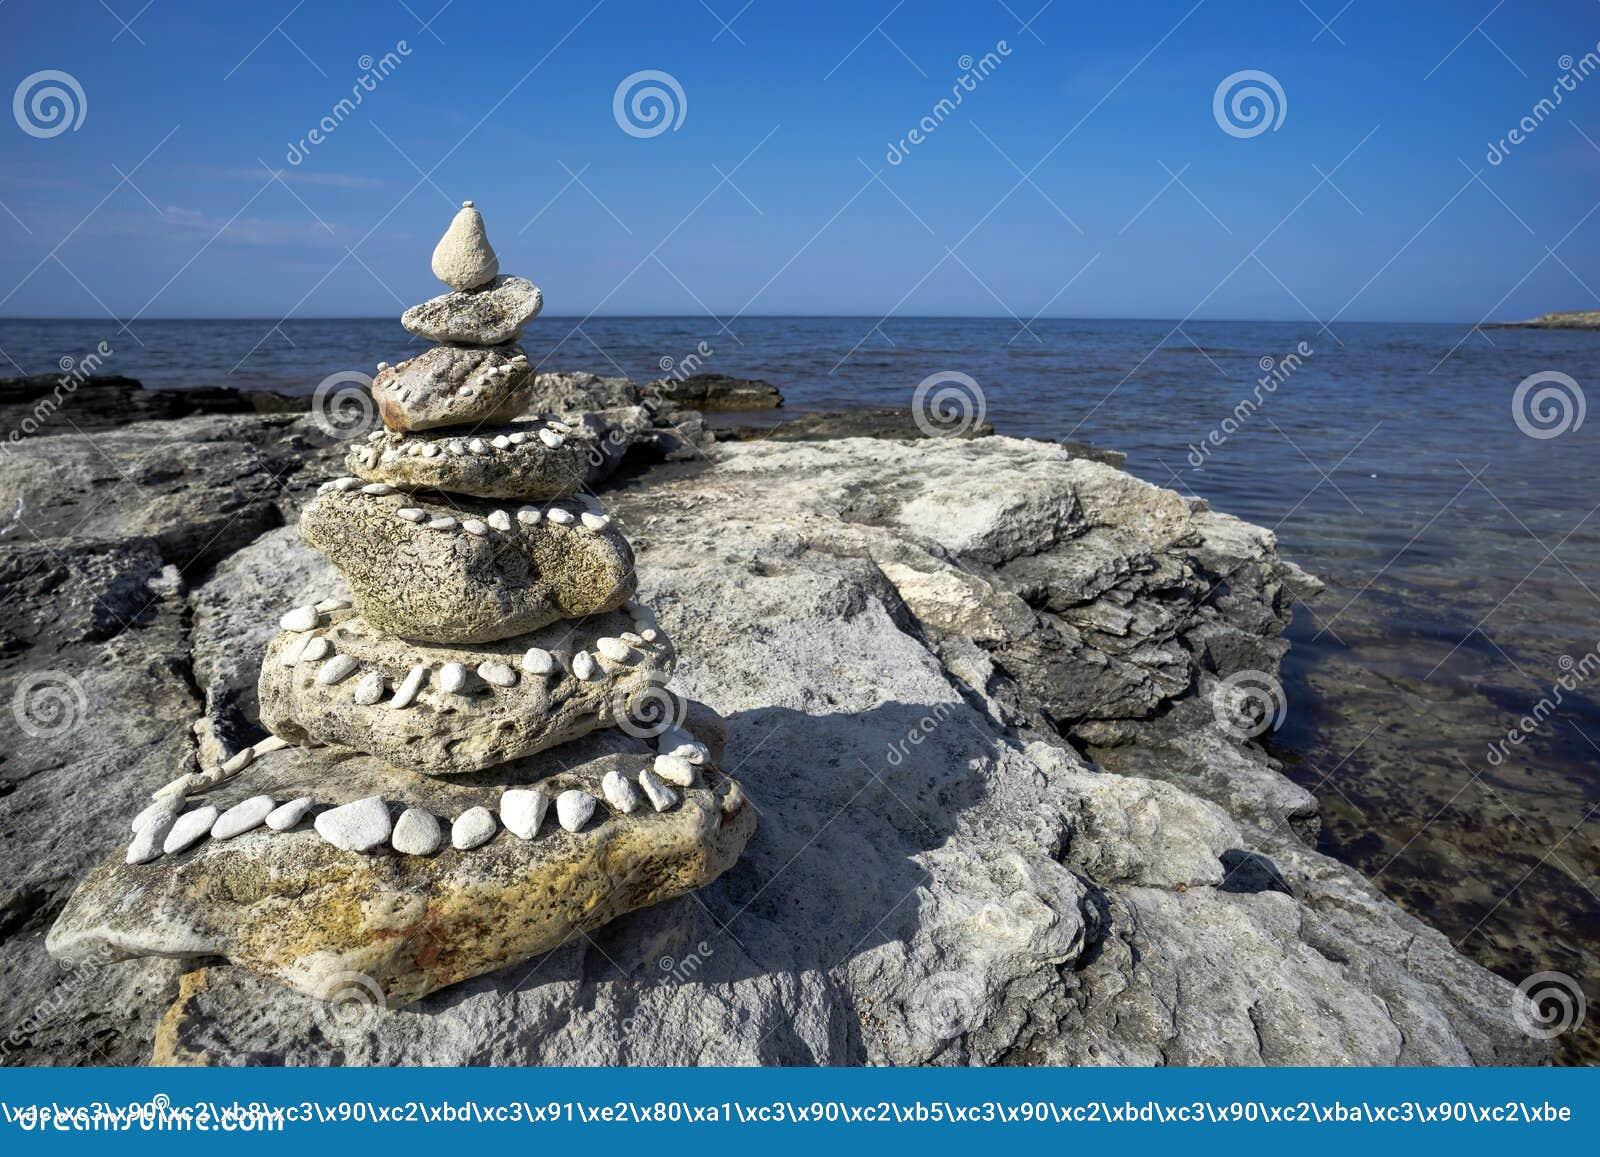 Download Πέτρινη πυραμίδα στην παραλία Στοκ Εικόνες - εικόνα από ισορροπία, τοπίο: 56562546